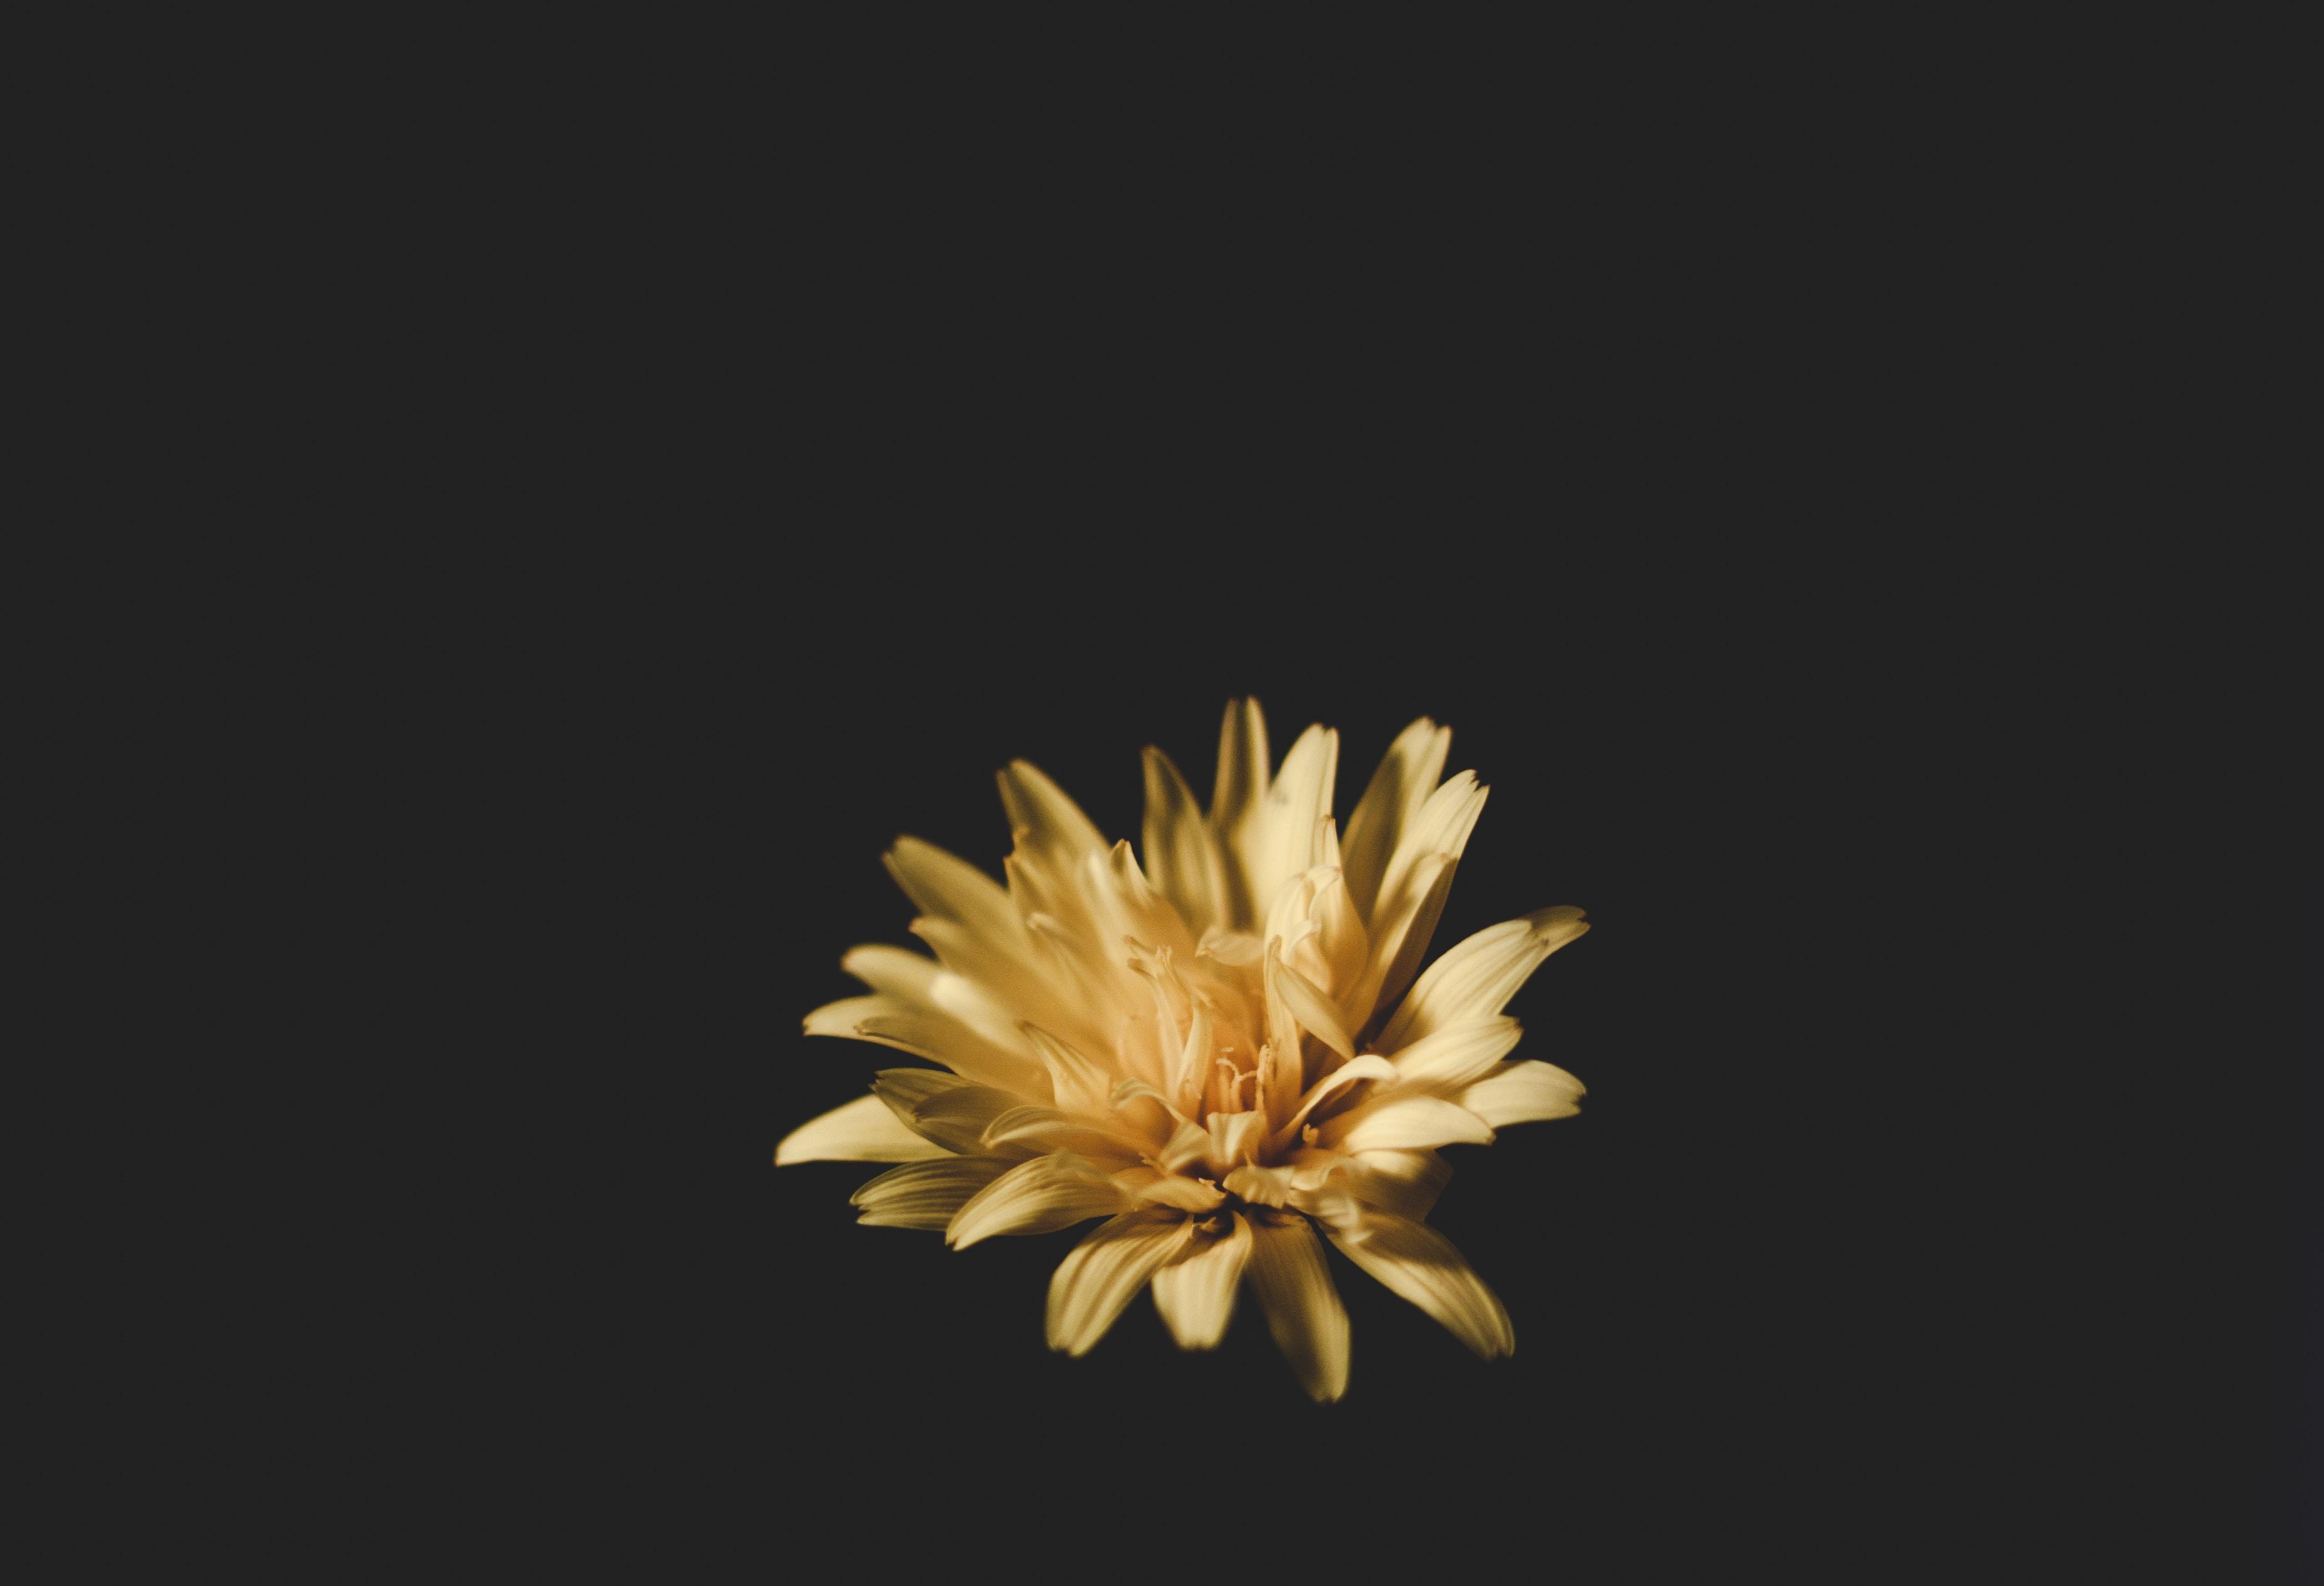 photo of yellow petaled flower